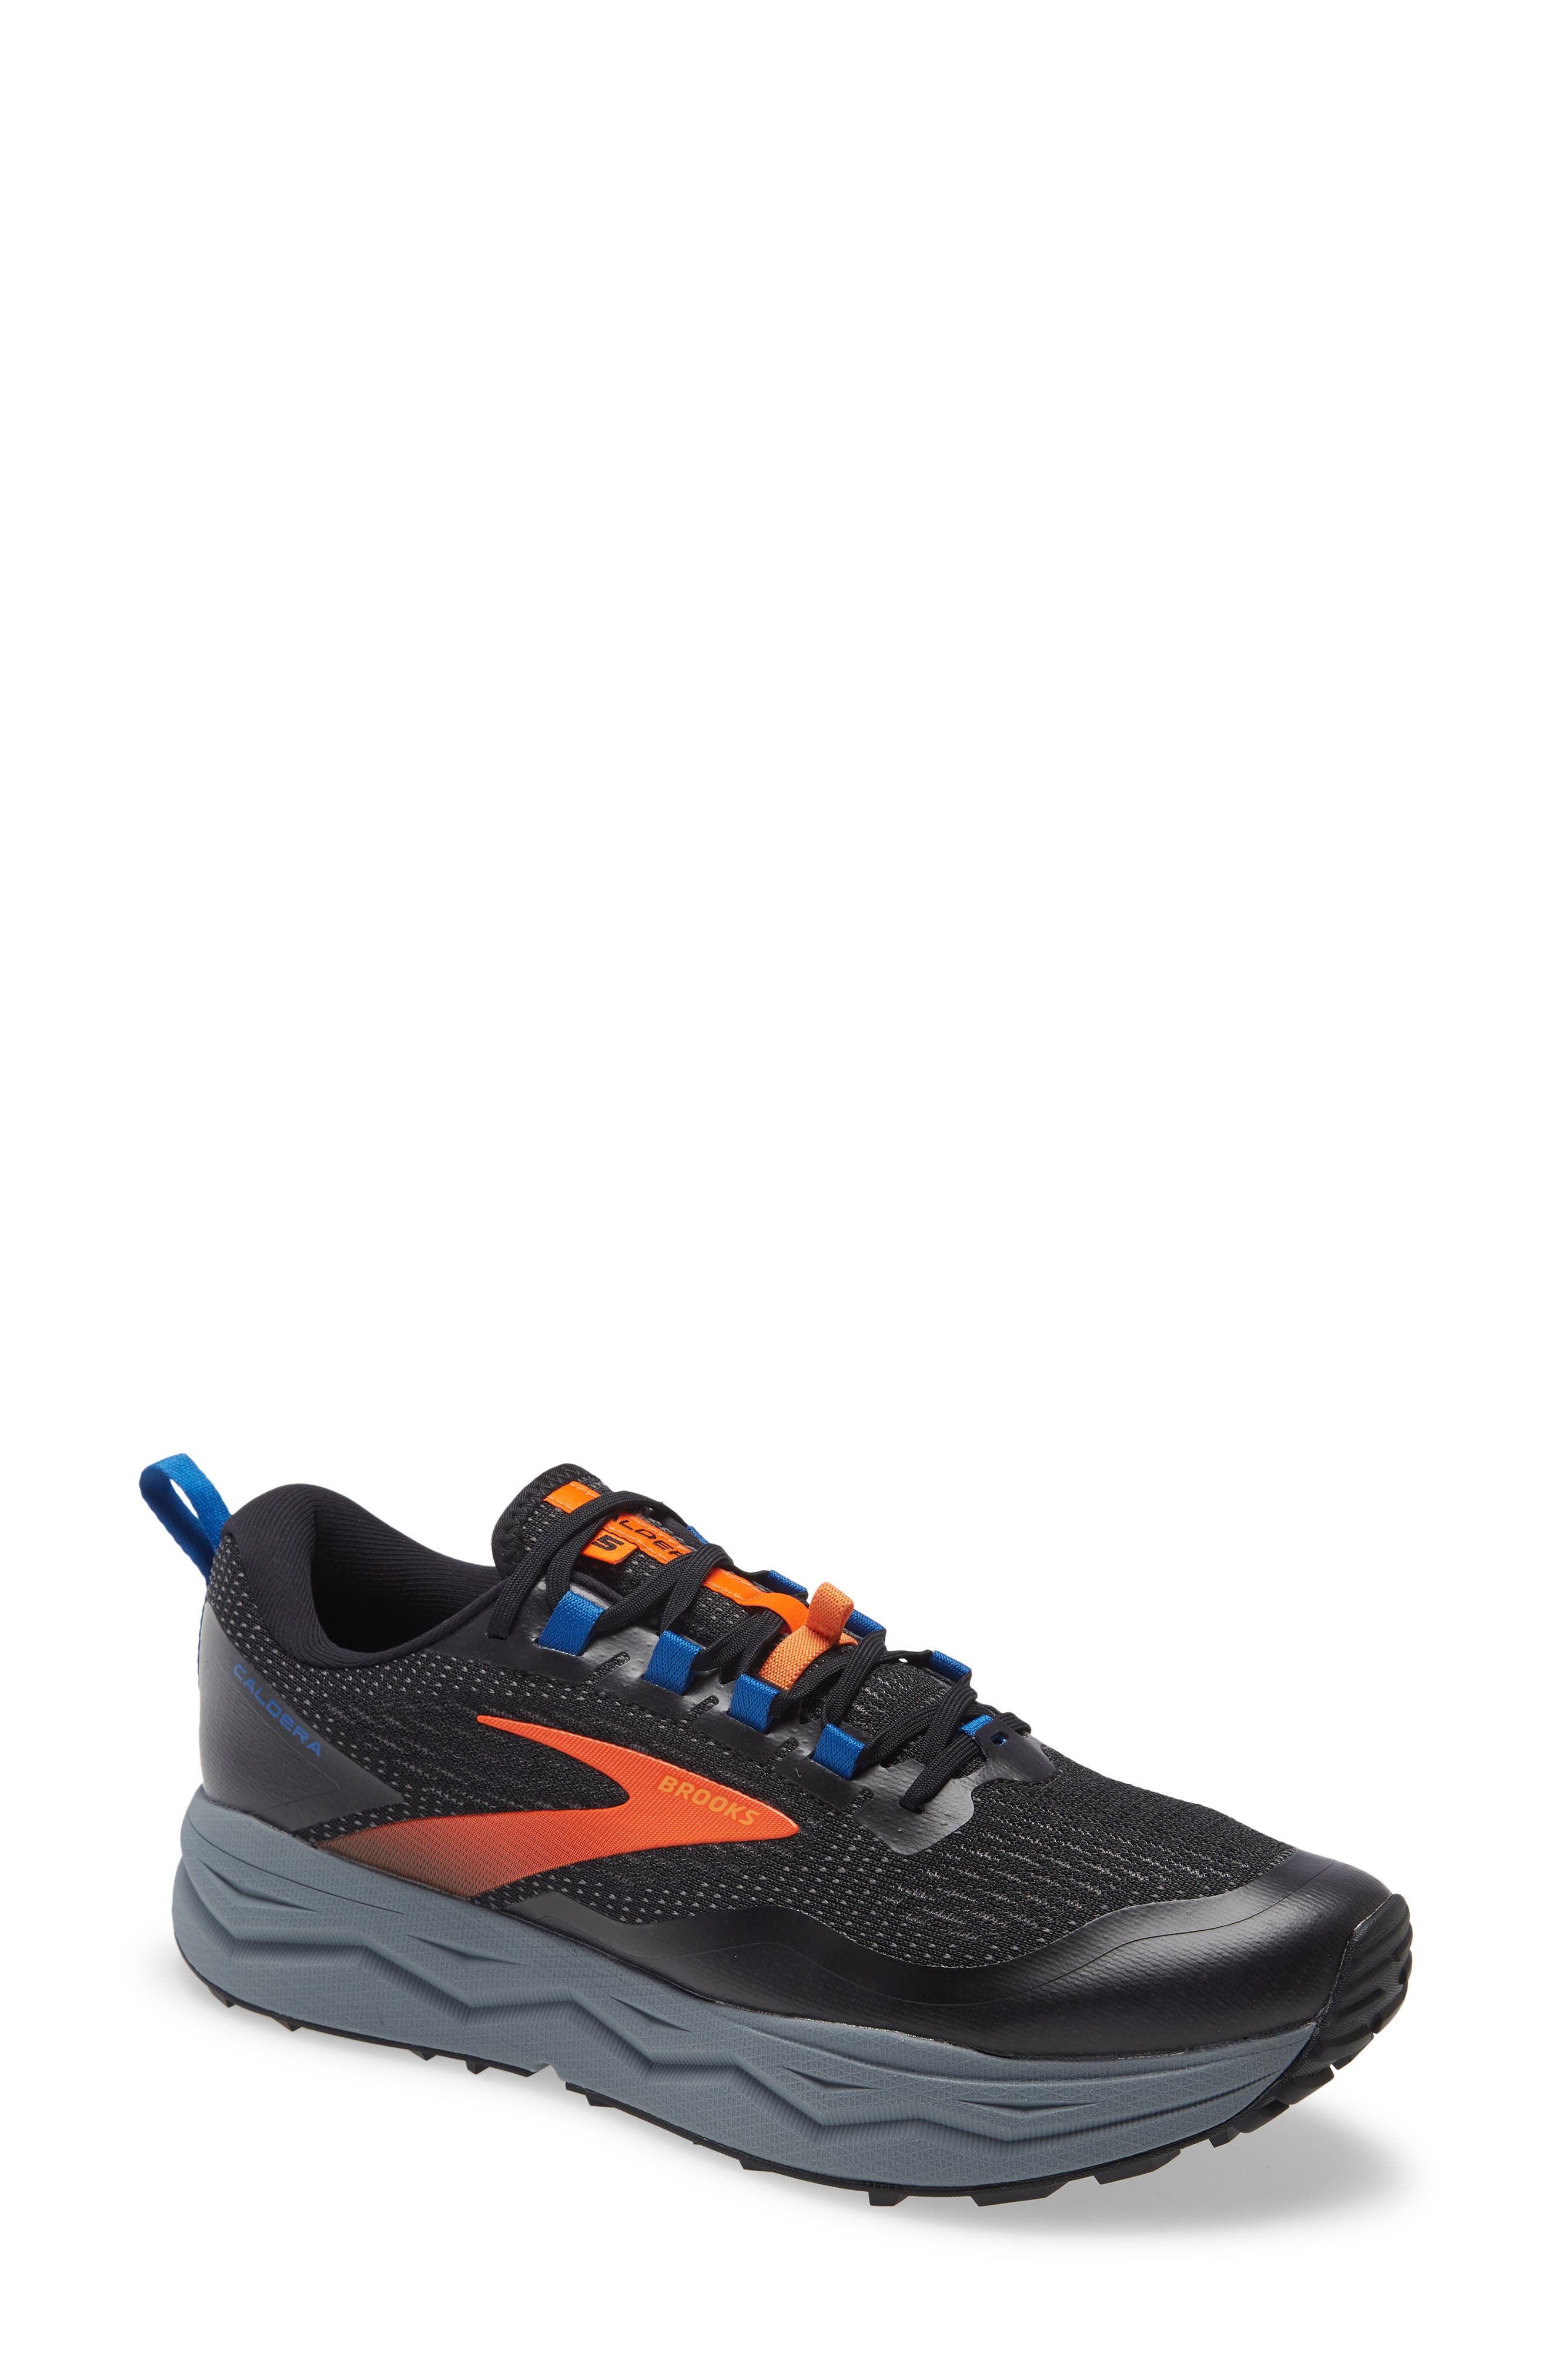 Caldera 5 Trail Running Shoe